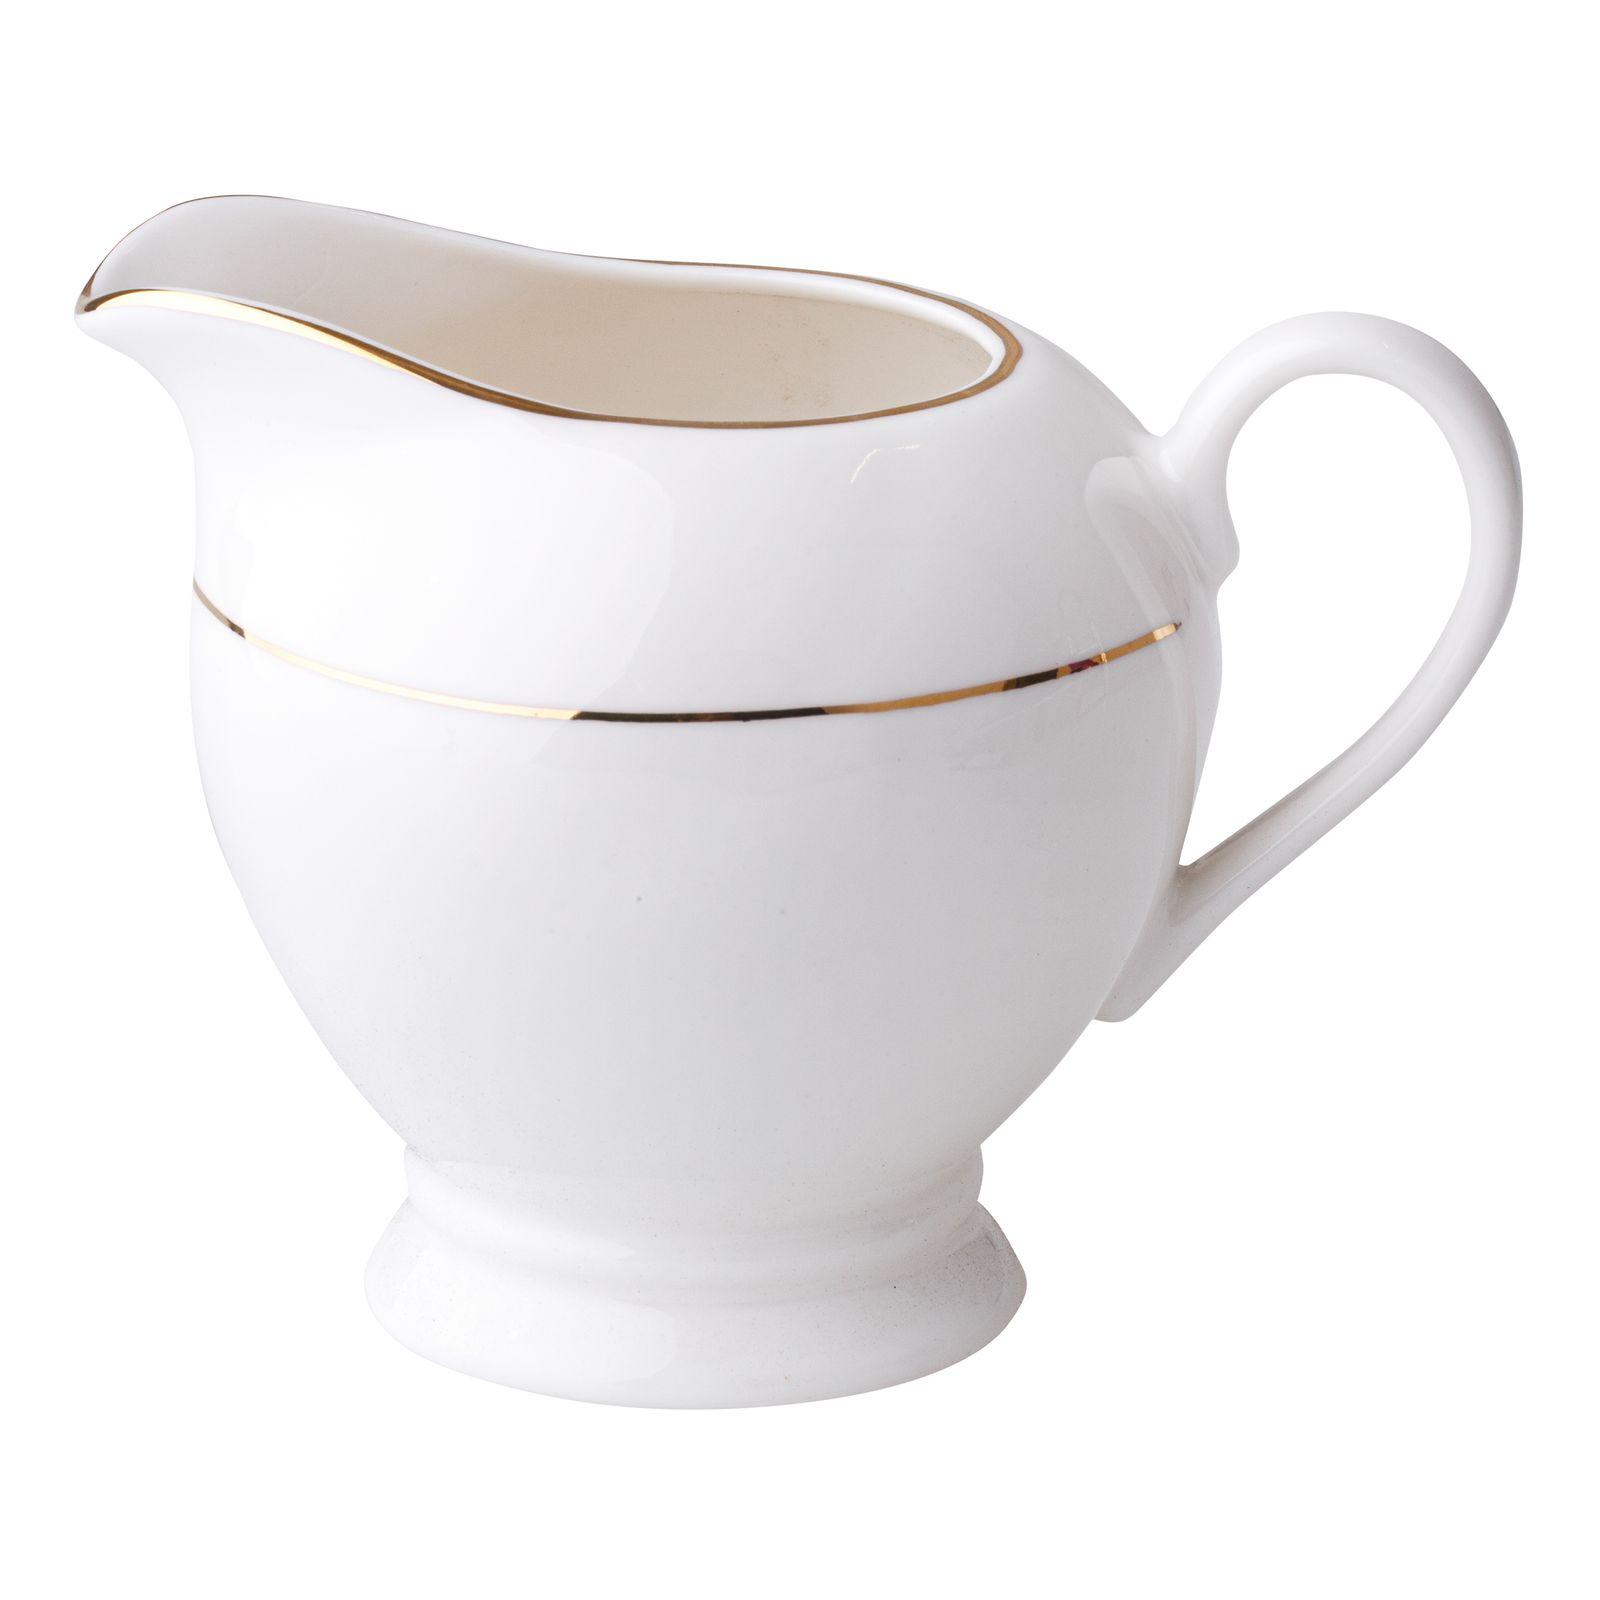 Porcelánová kanvička na mlieko Aura Gold 300 ml AMBITION